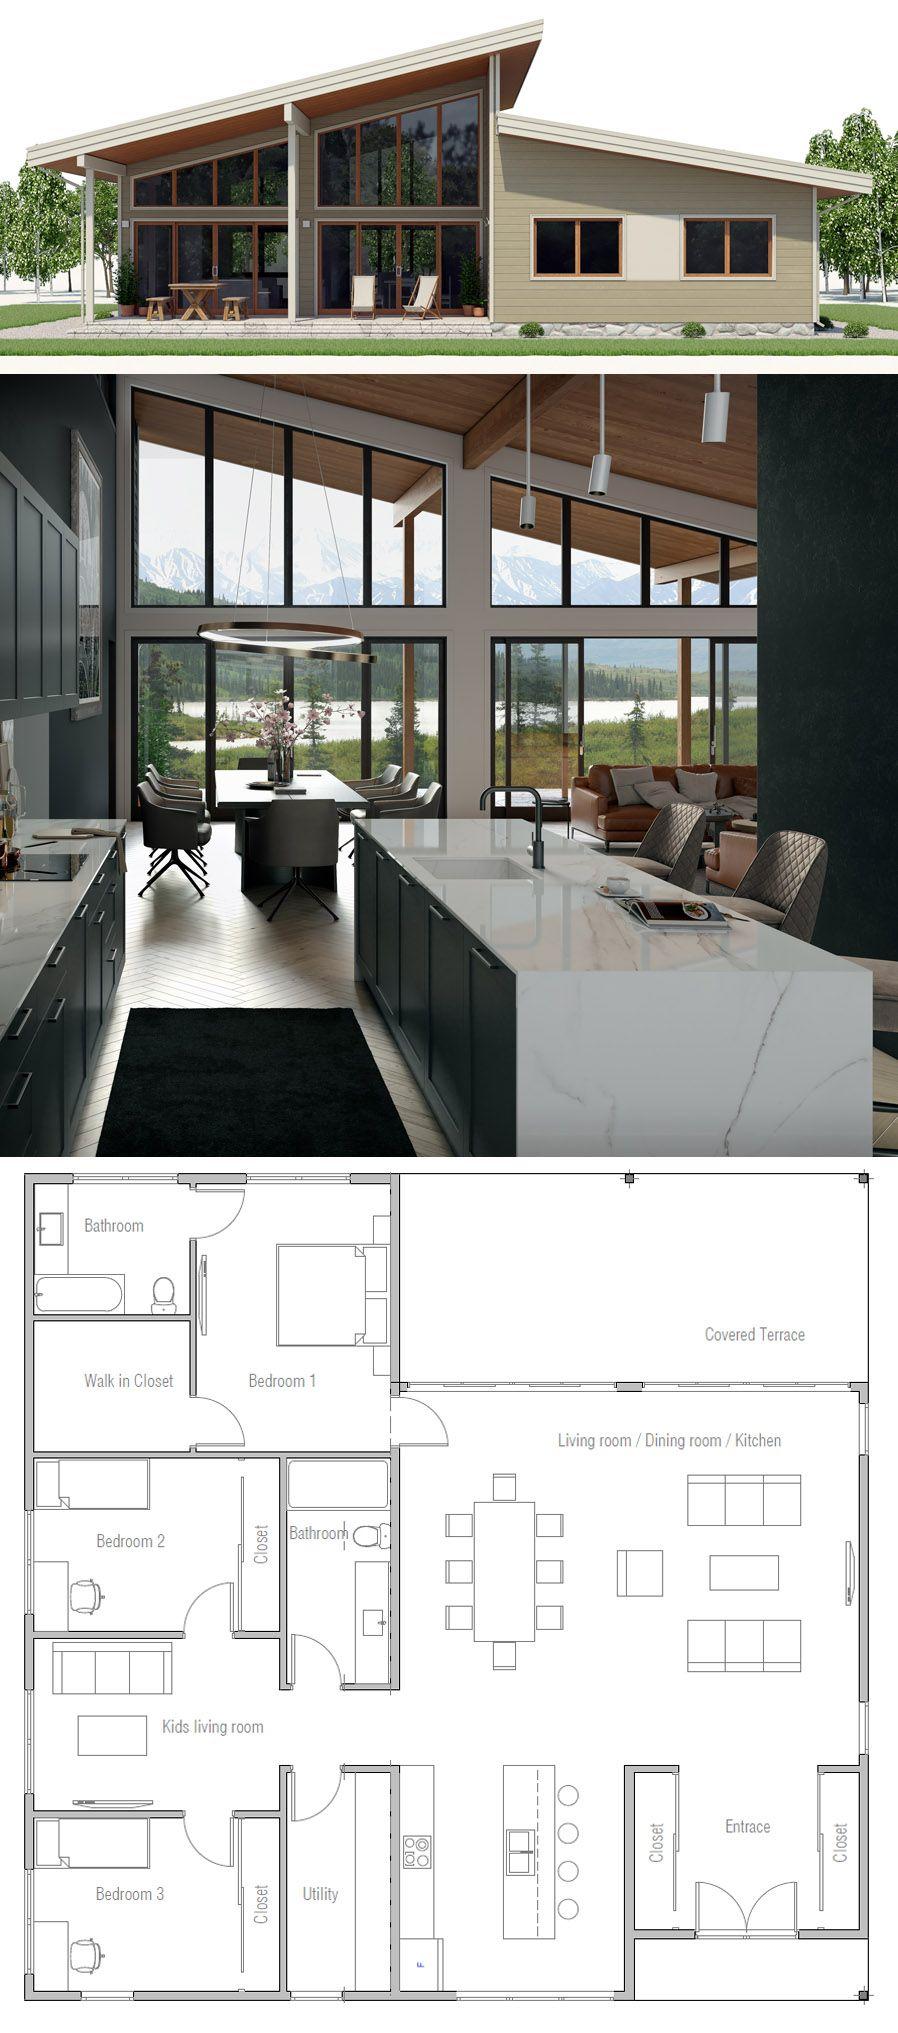 Small house plan home homeplans houseplans adhouseplans floorplans also rh pinterest